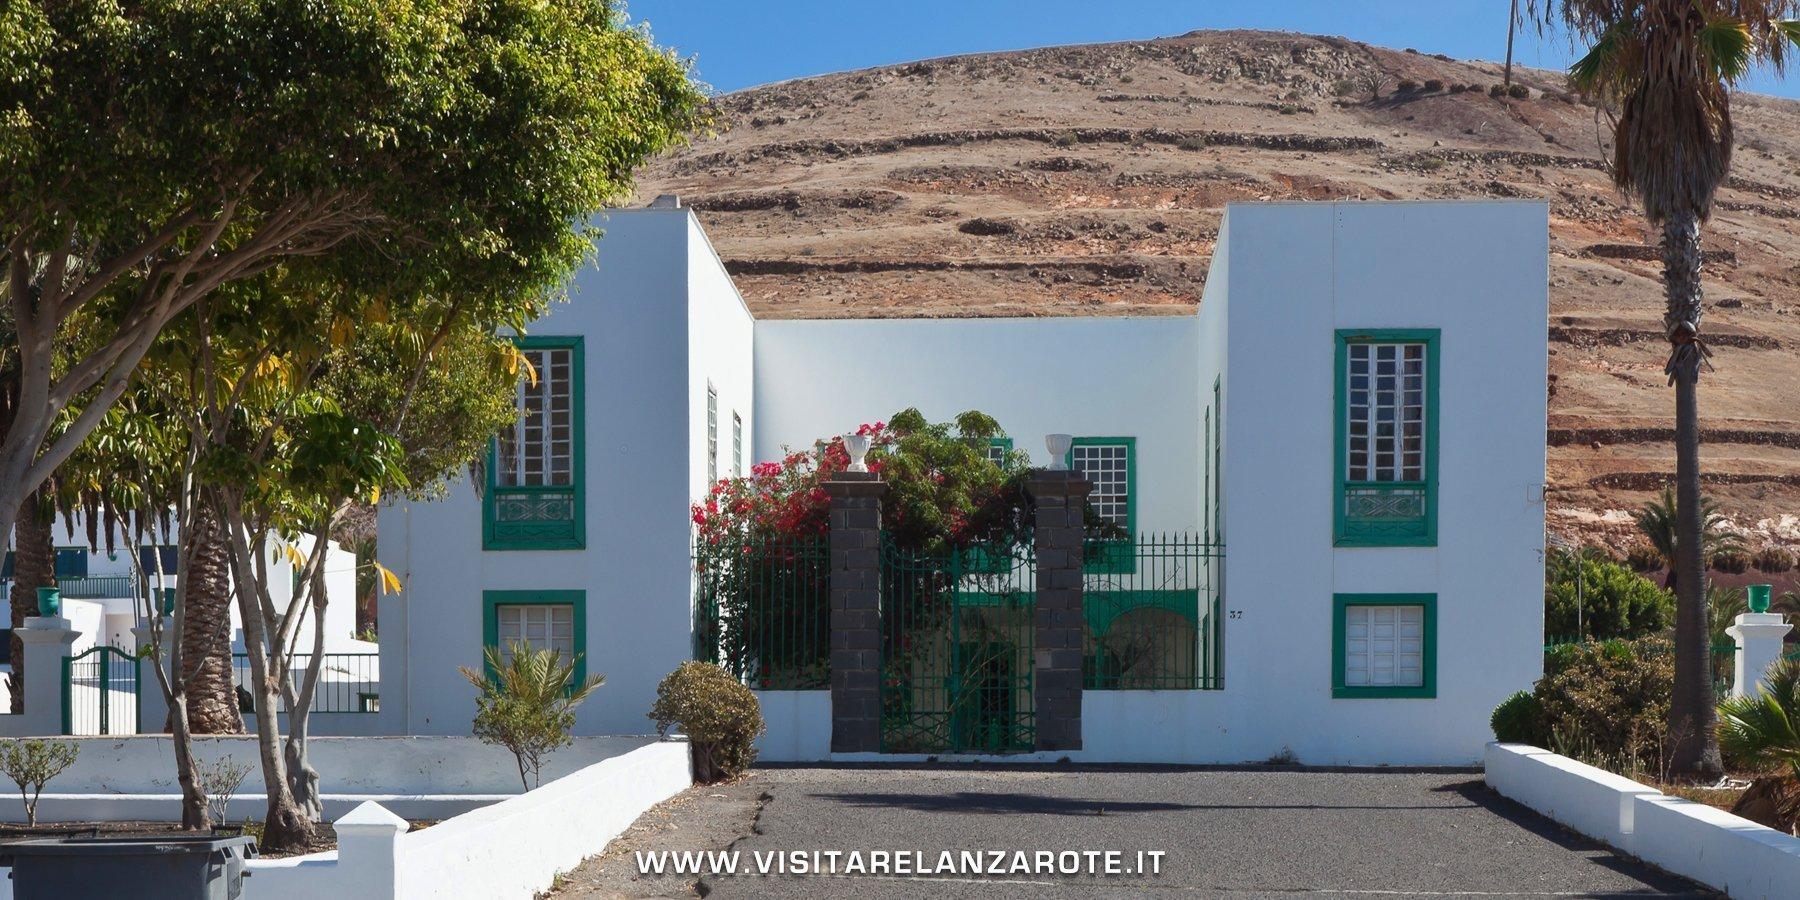 yaiza Lanzarote